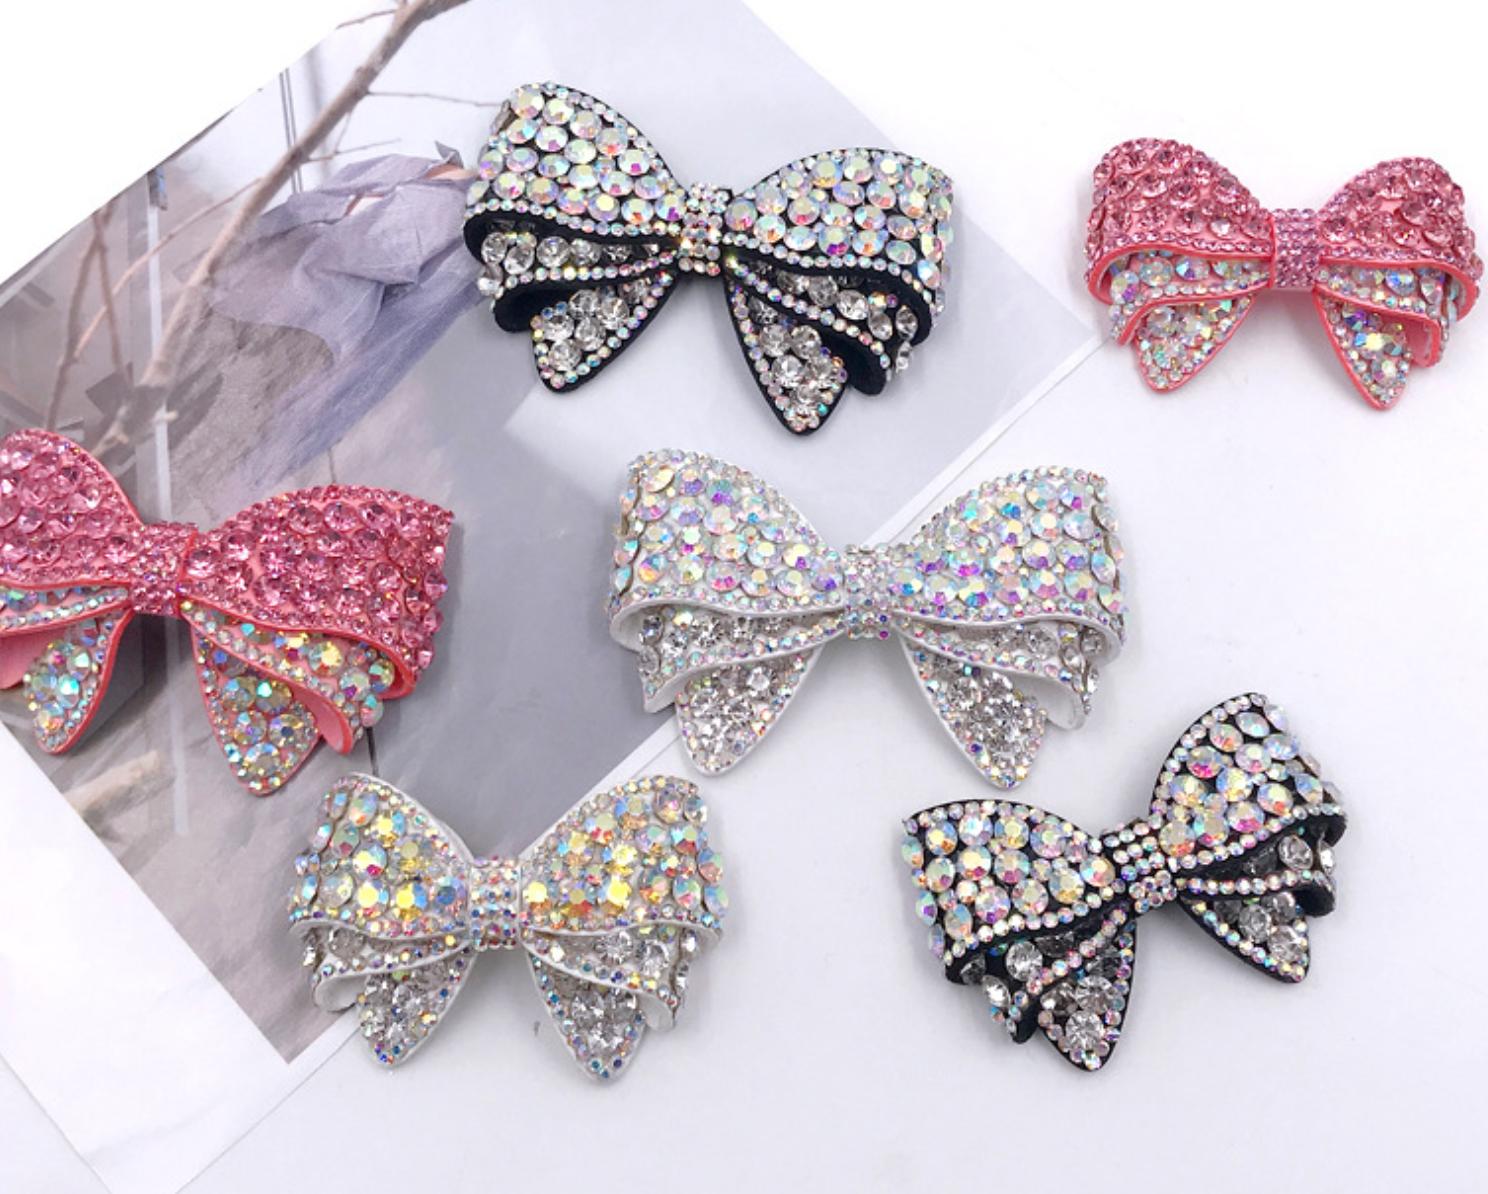 2 Pcs Rhinestone Crystal Bridal Bow Fashion Wedding Shoes Shoe Clips